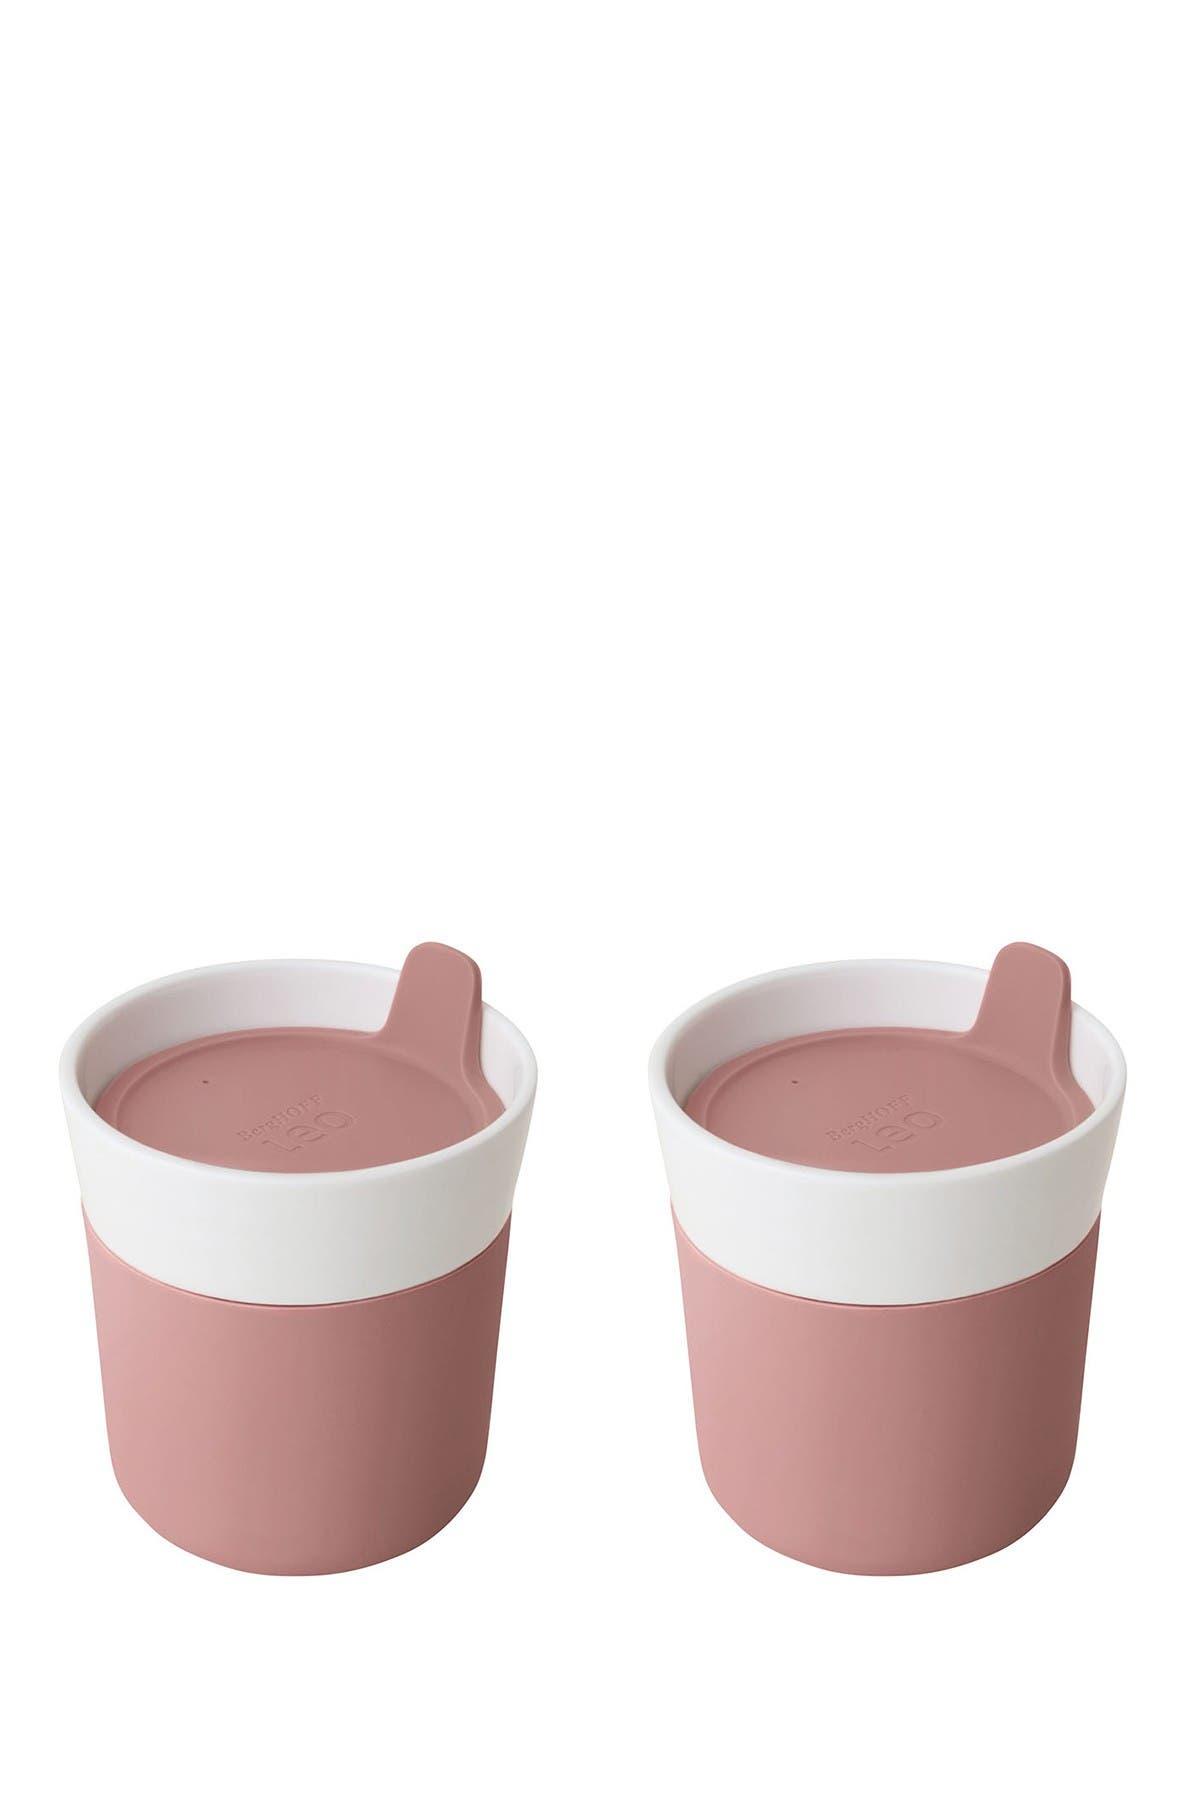 Image of BergHOFF Leo 8.45oz Porcelain Travel Mug - Set of 2